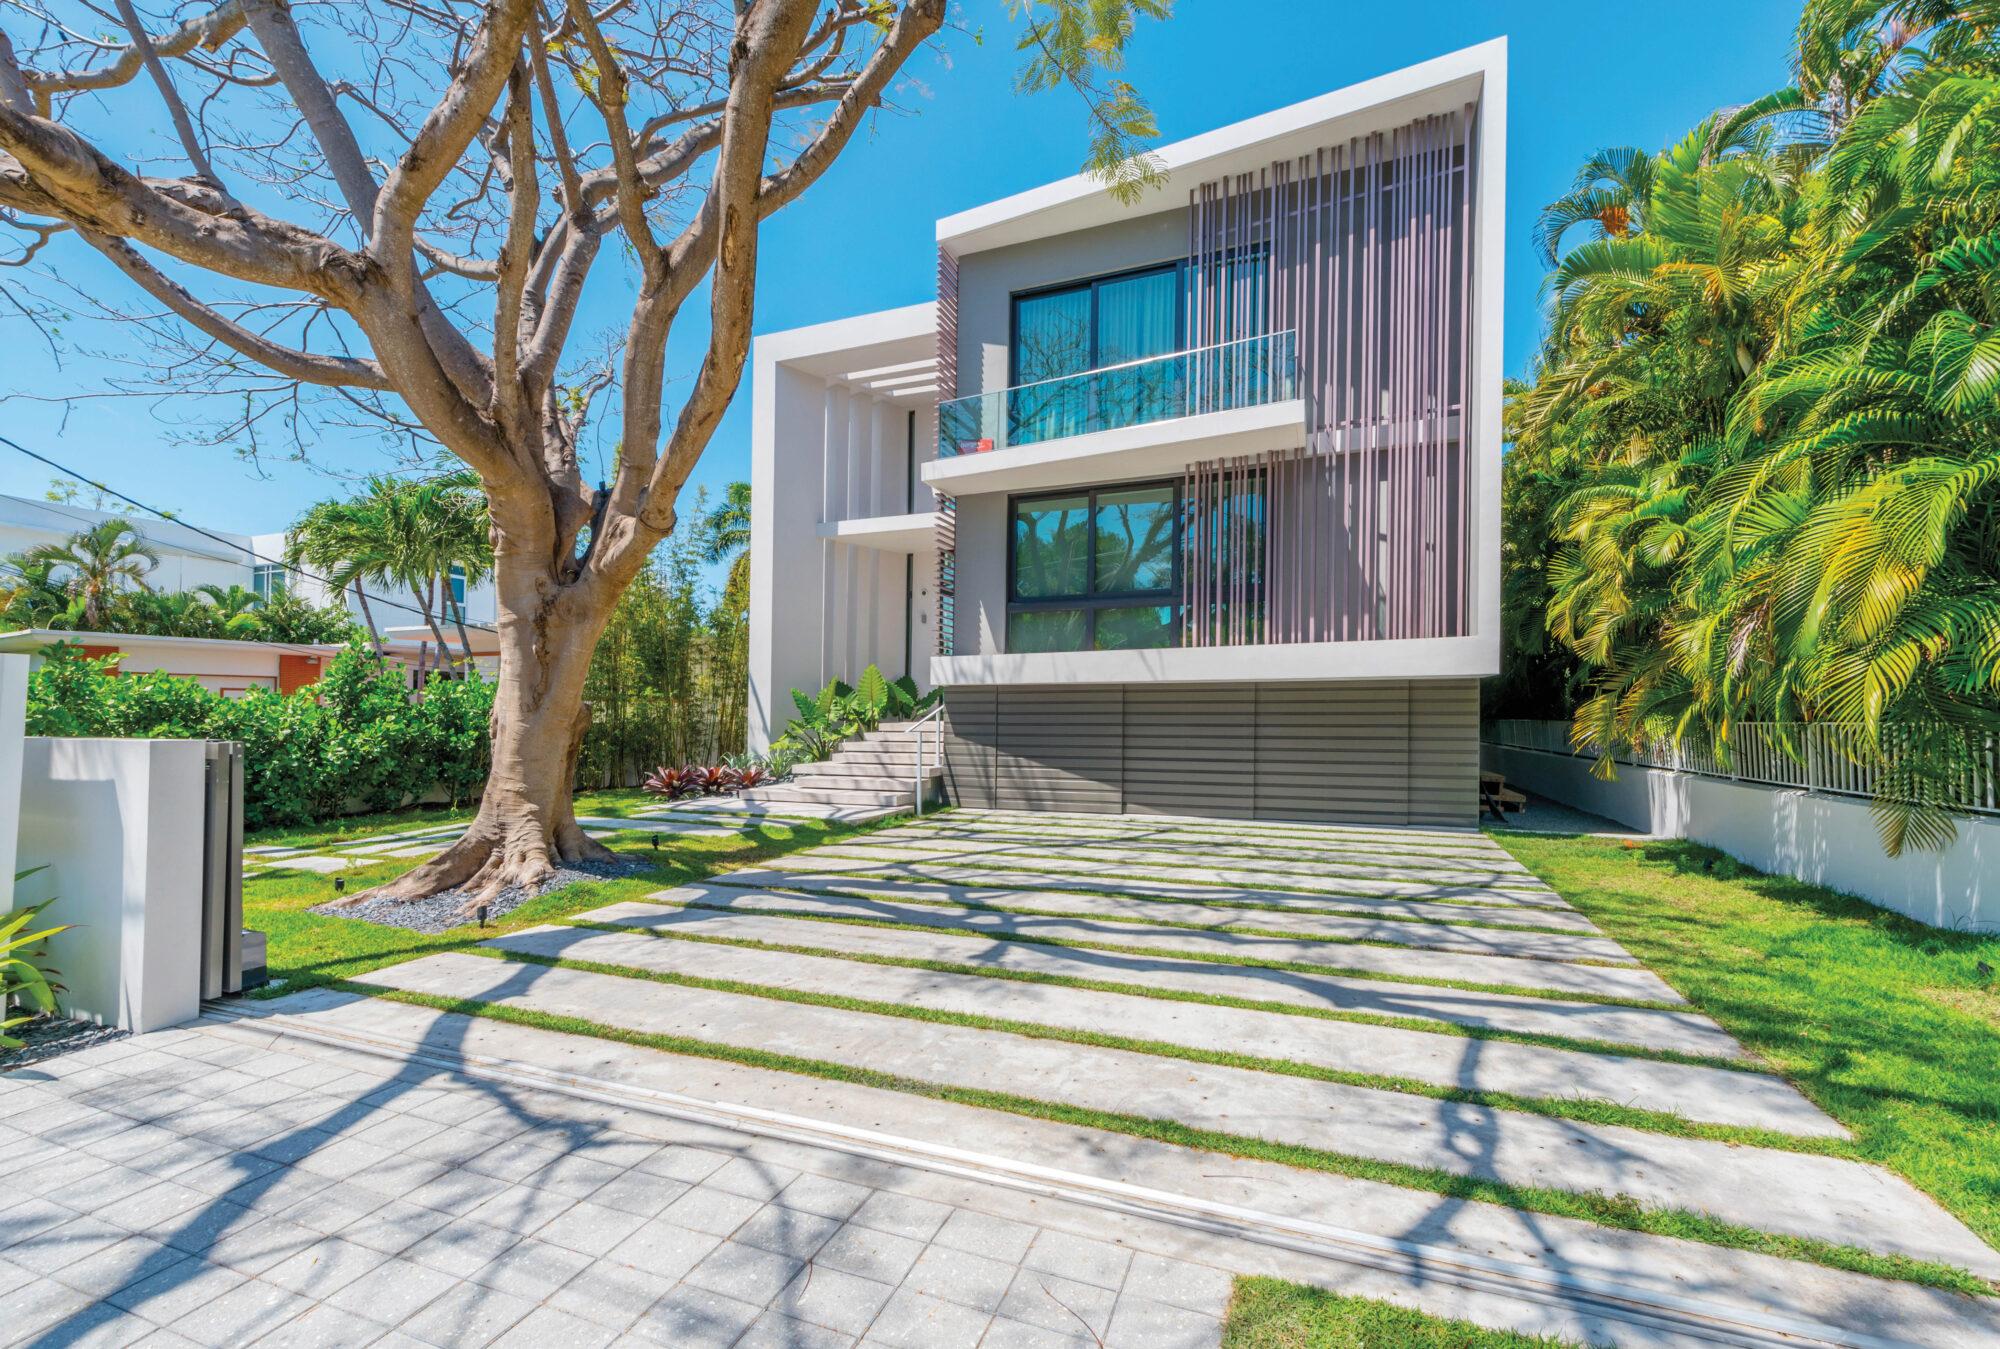 Miami Architect Reinaldo Borges Shares Plans For The Future {Miami Architect Reinaldo Borges Shares Plans For The Future} – English